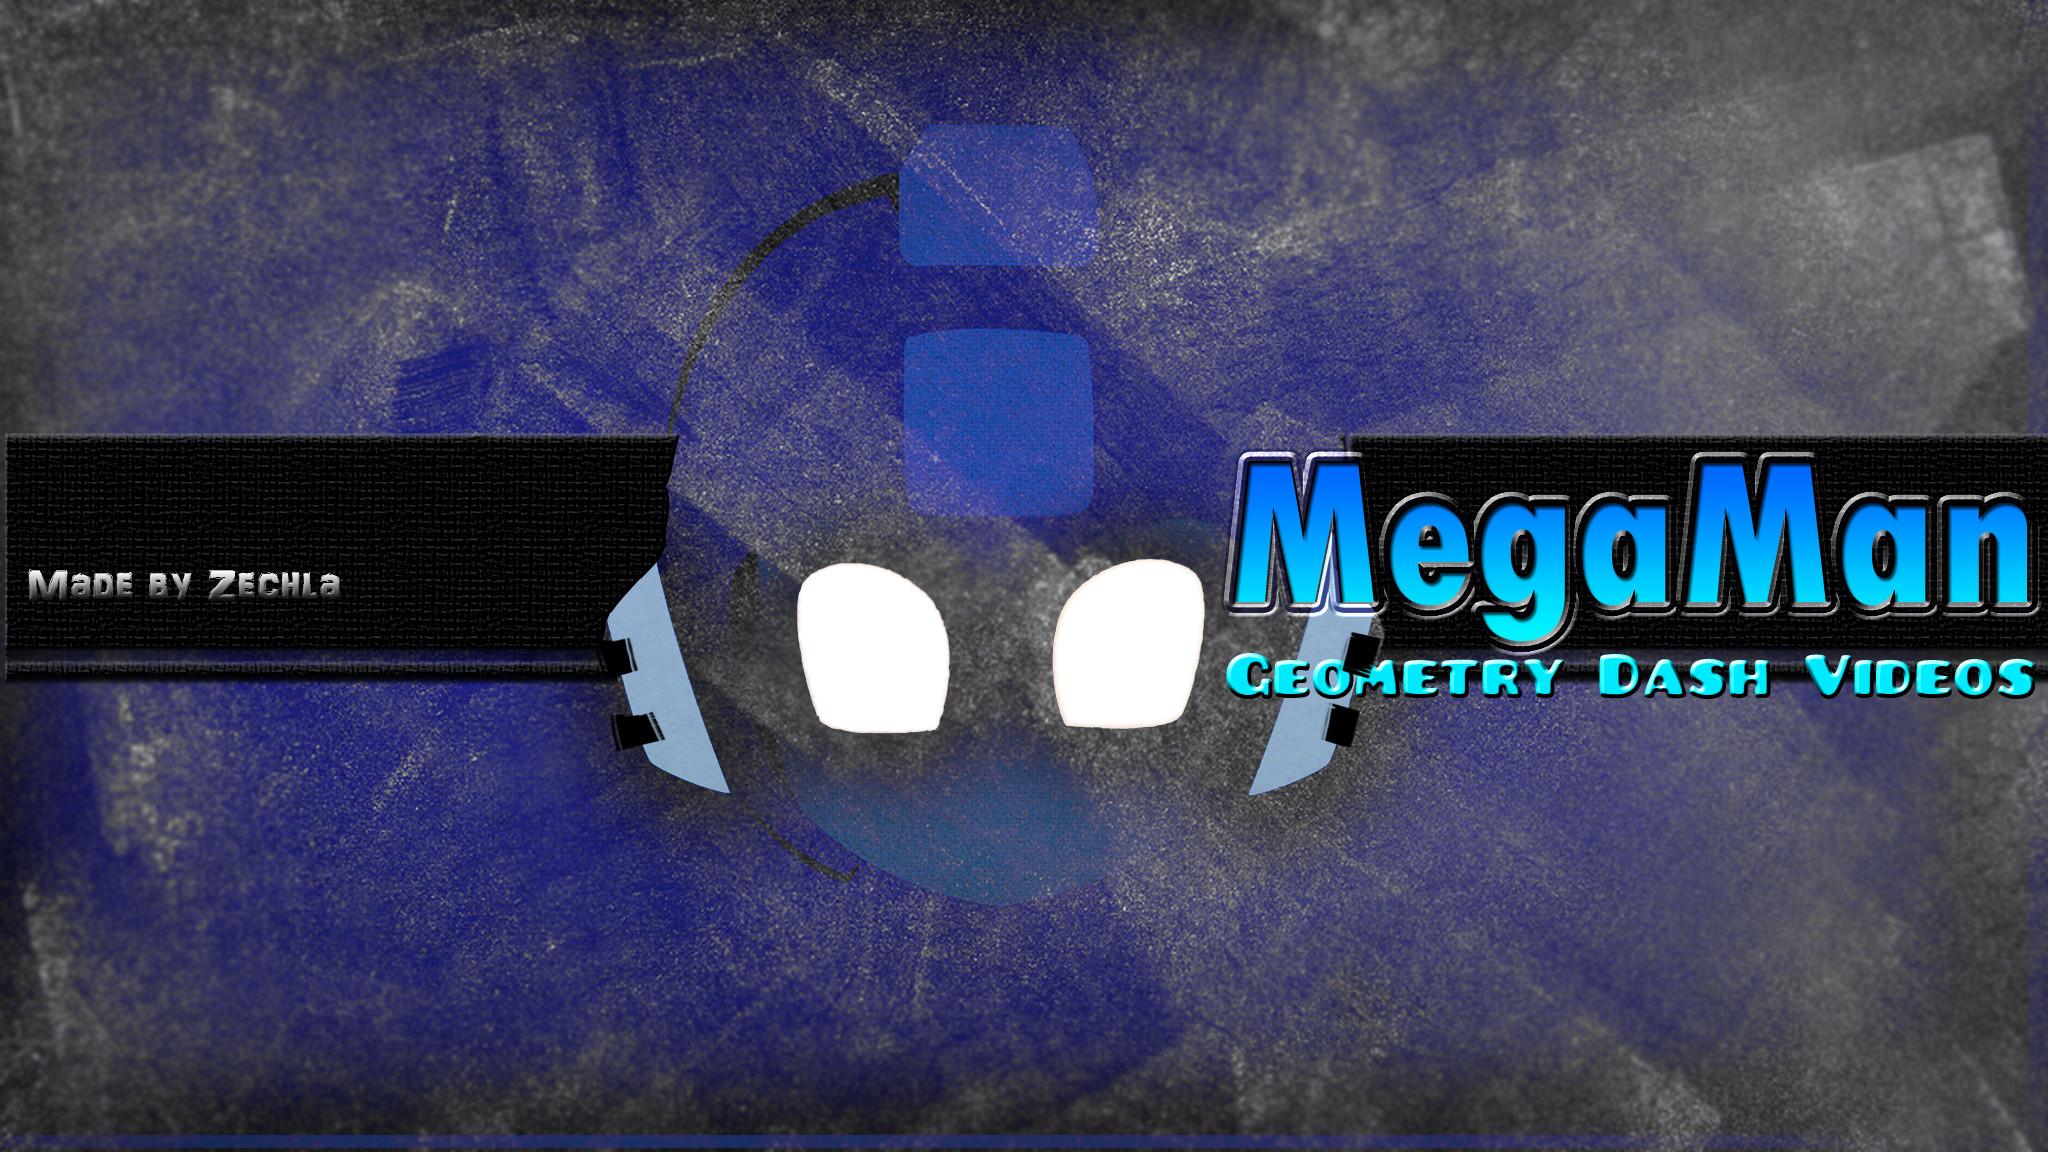 … Dash' Megaman's YouTube Banner …